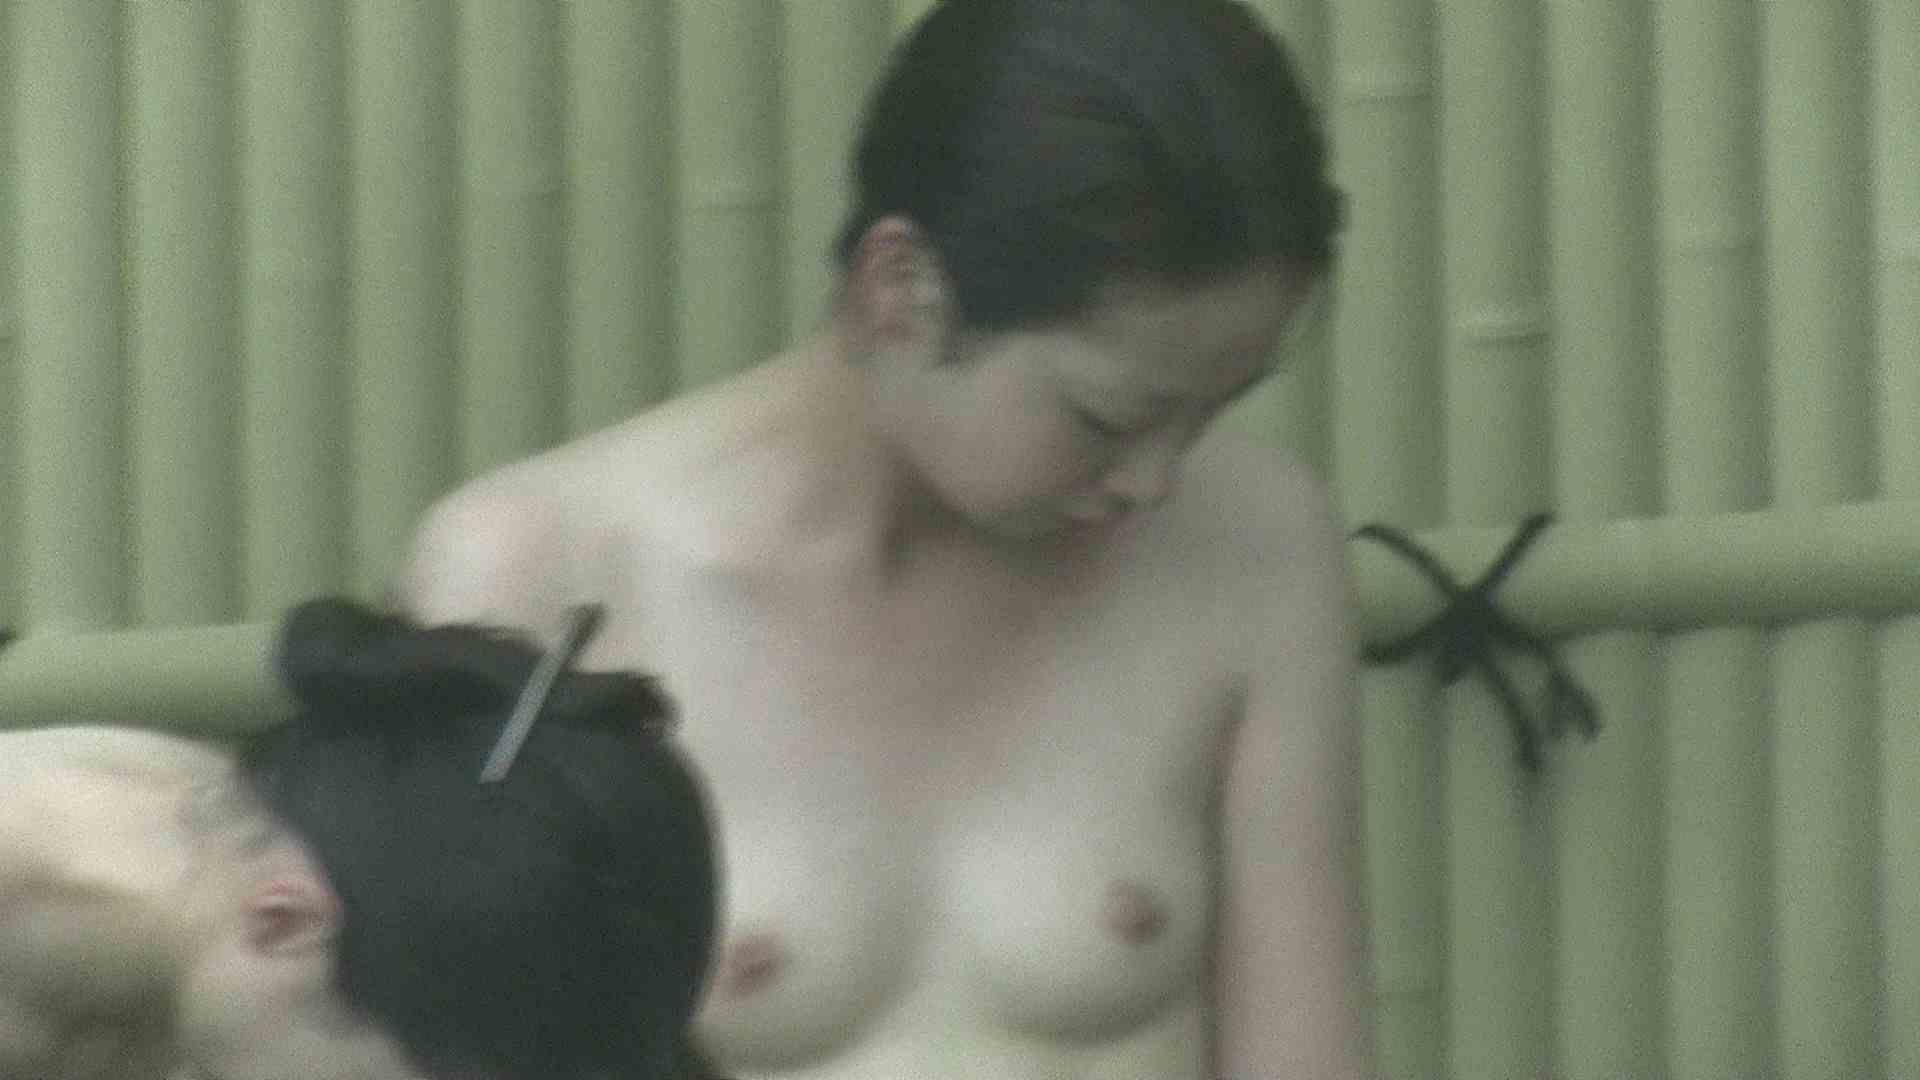 Aquaな露天風呂Vol.195 OLセックス 盗撮ワレメ無修正動画無料 71画像 59